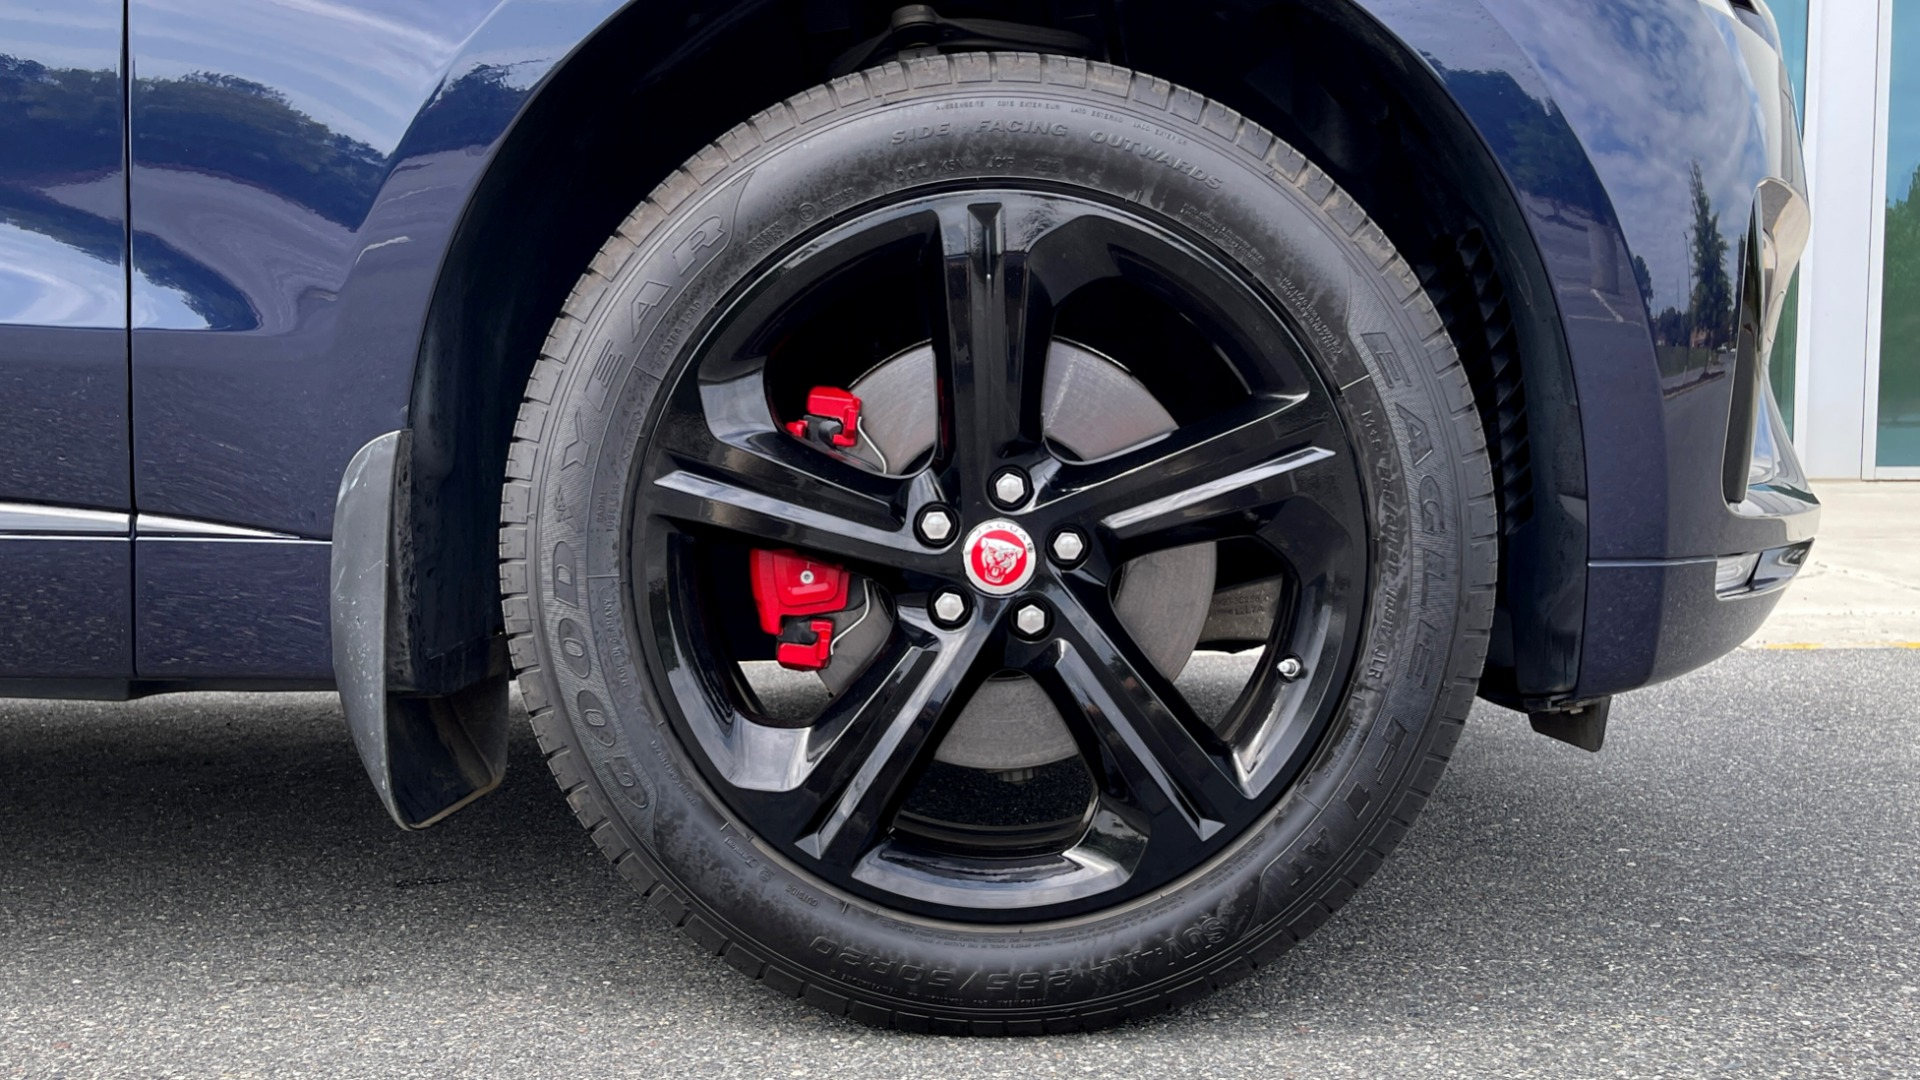 Used 2019 Jaguar F-PACE S / DRIVE PKG / BSA / HUD / BLACK EXT PKG / REARVIEW for sale $50,995 at Formula Imports in Charlotte NC 28227 70